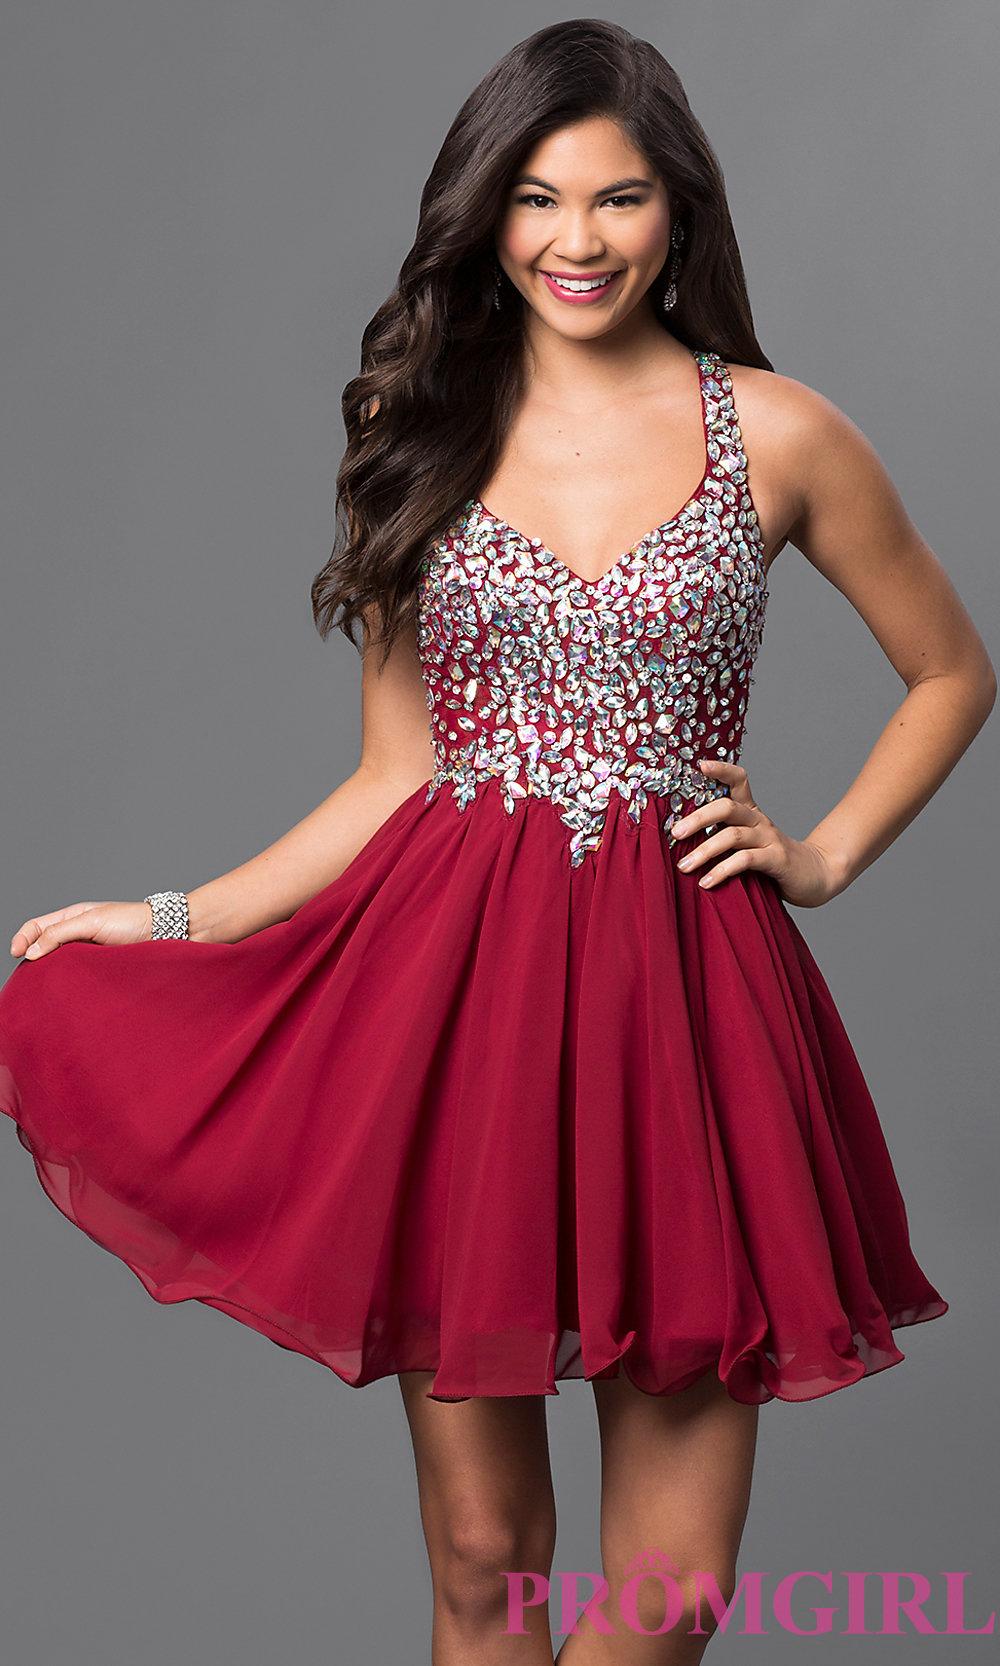 Short Prom Dress hover to zoom DMKZXNL